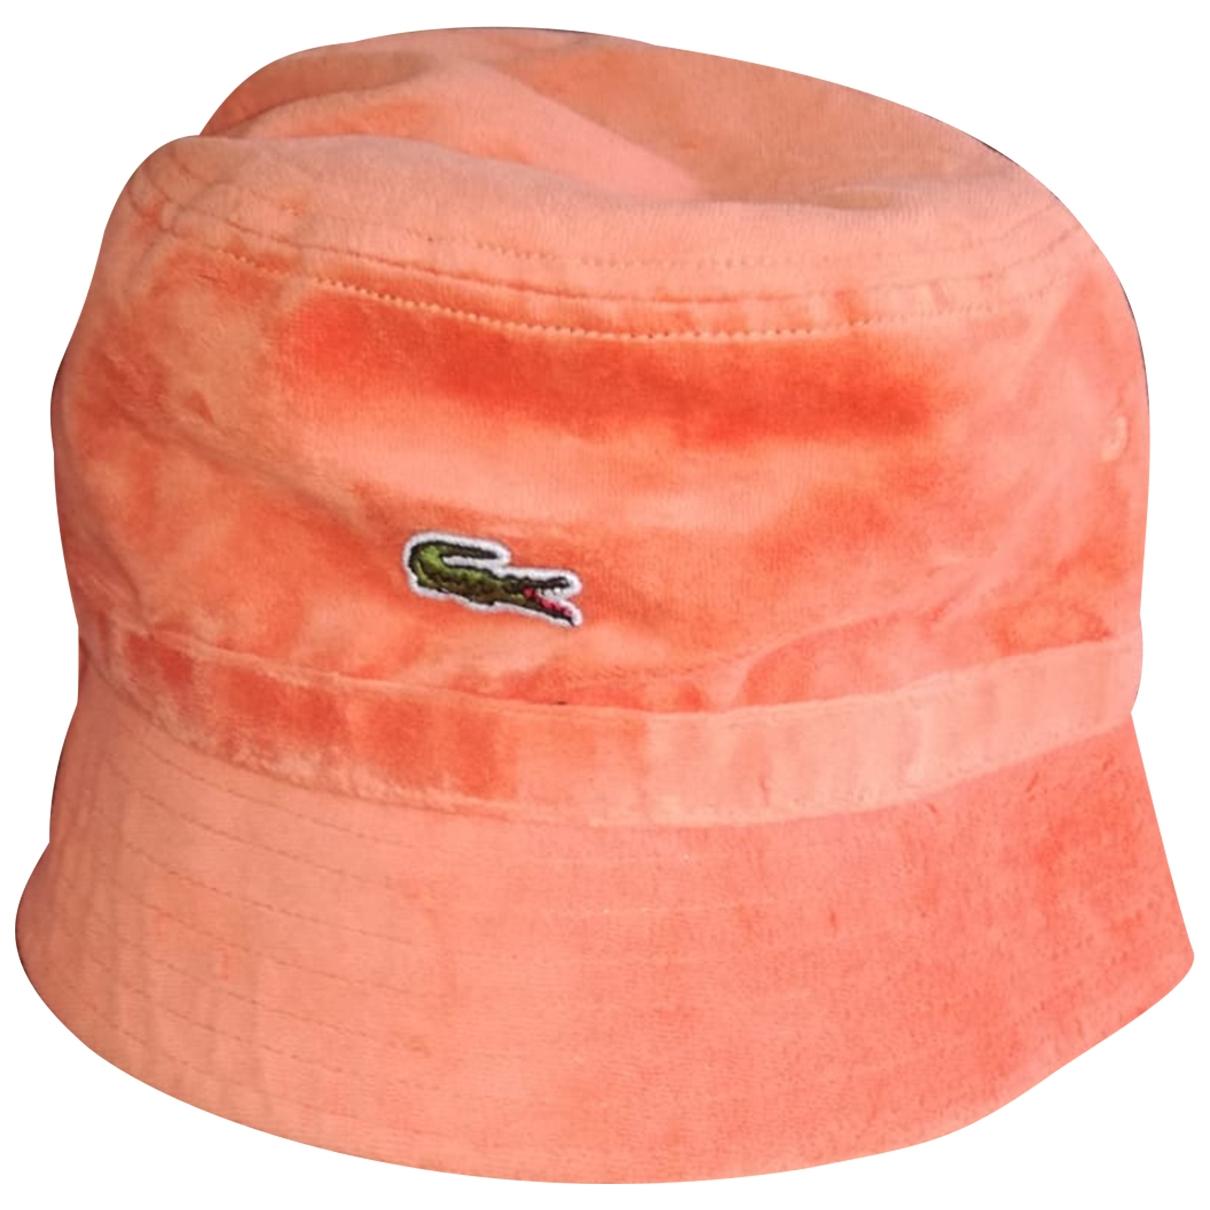 Lacoste \N Orange hat & pull on hat for Men 60 cm